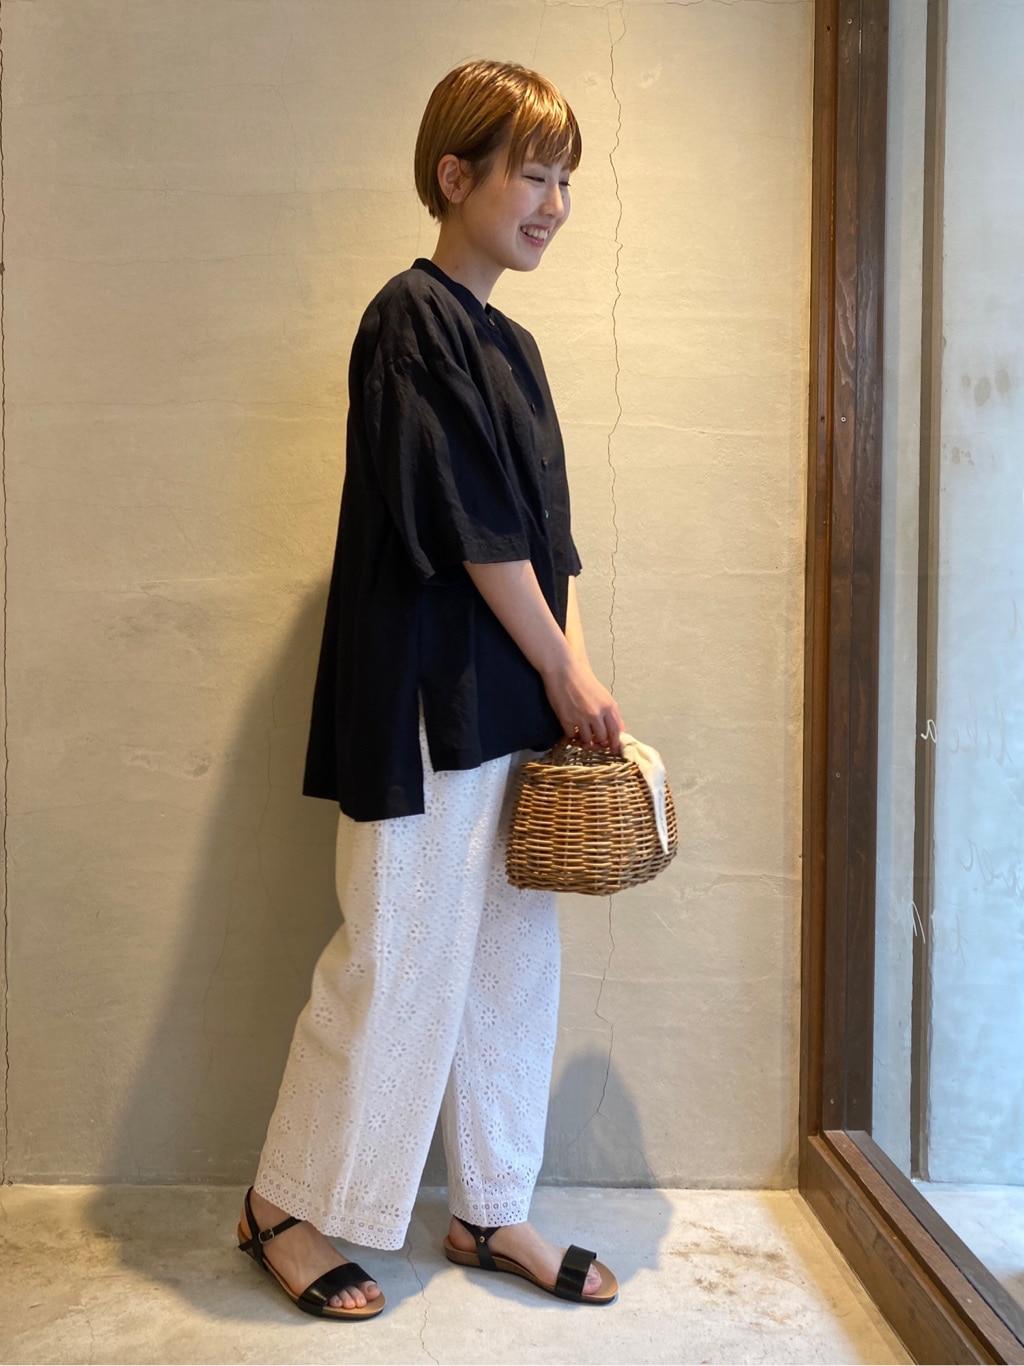 yuni 神戸路面 身長:155cm 2021.05.14